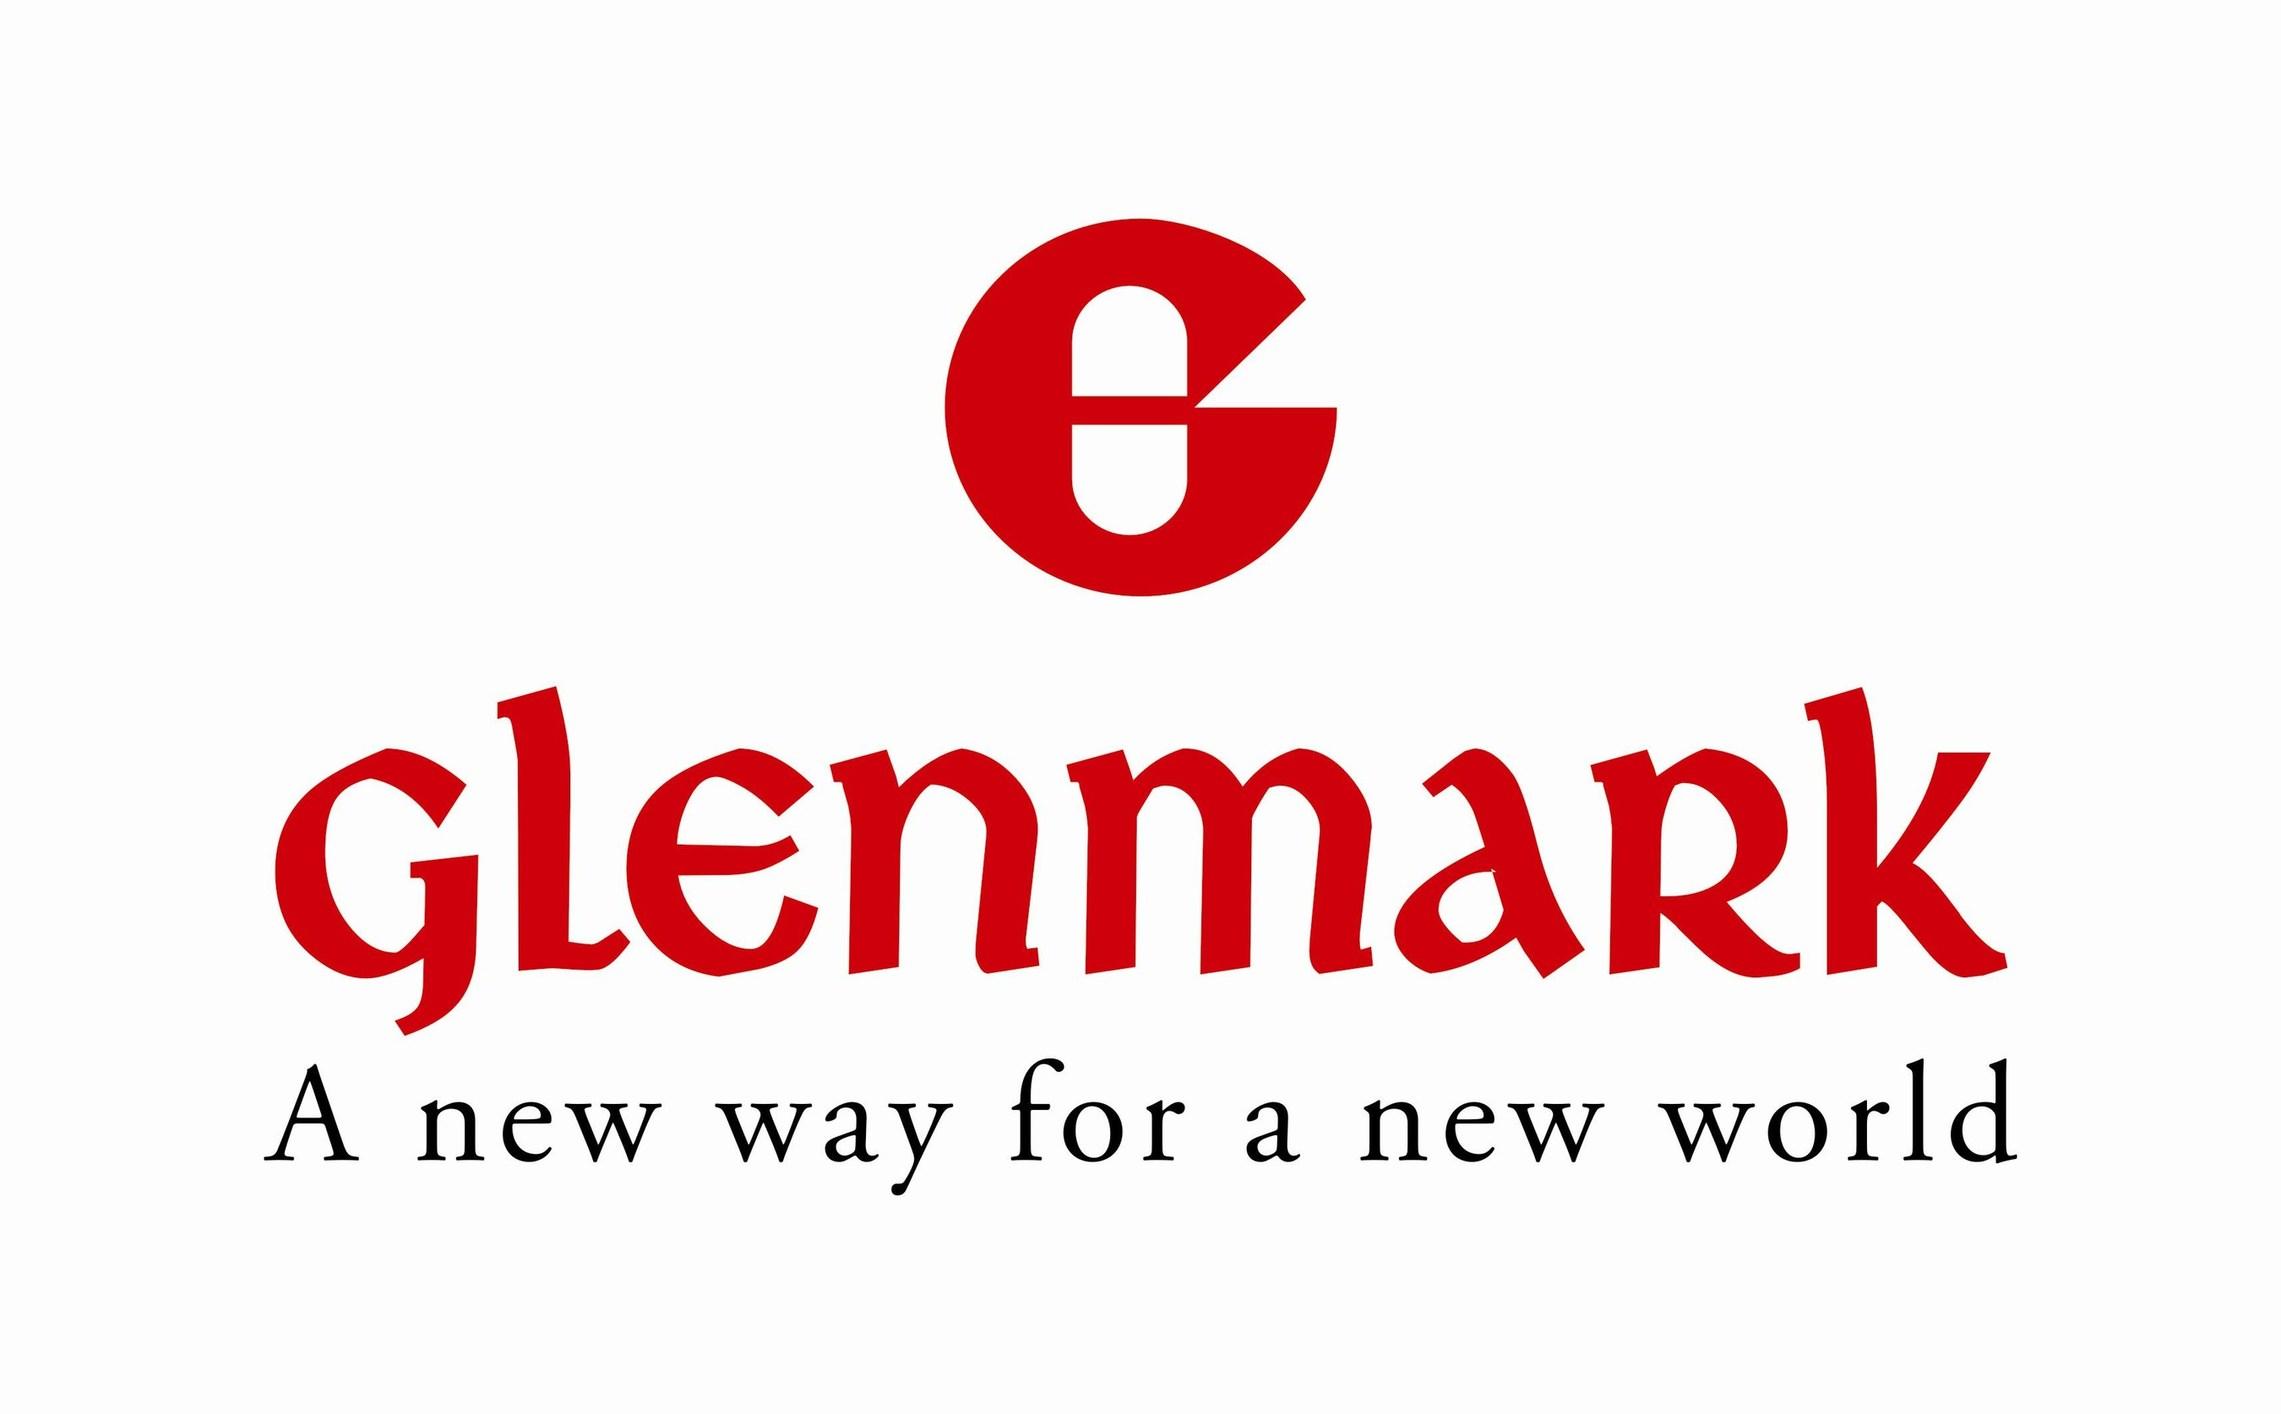 PRNE Glenmark Logo jpg?p=facebook.